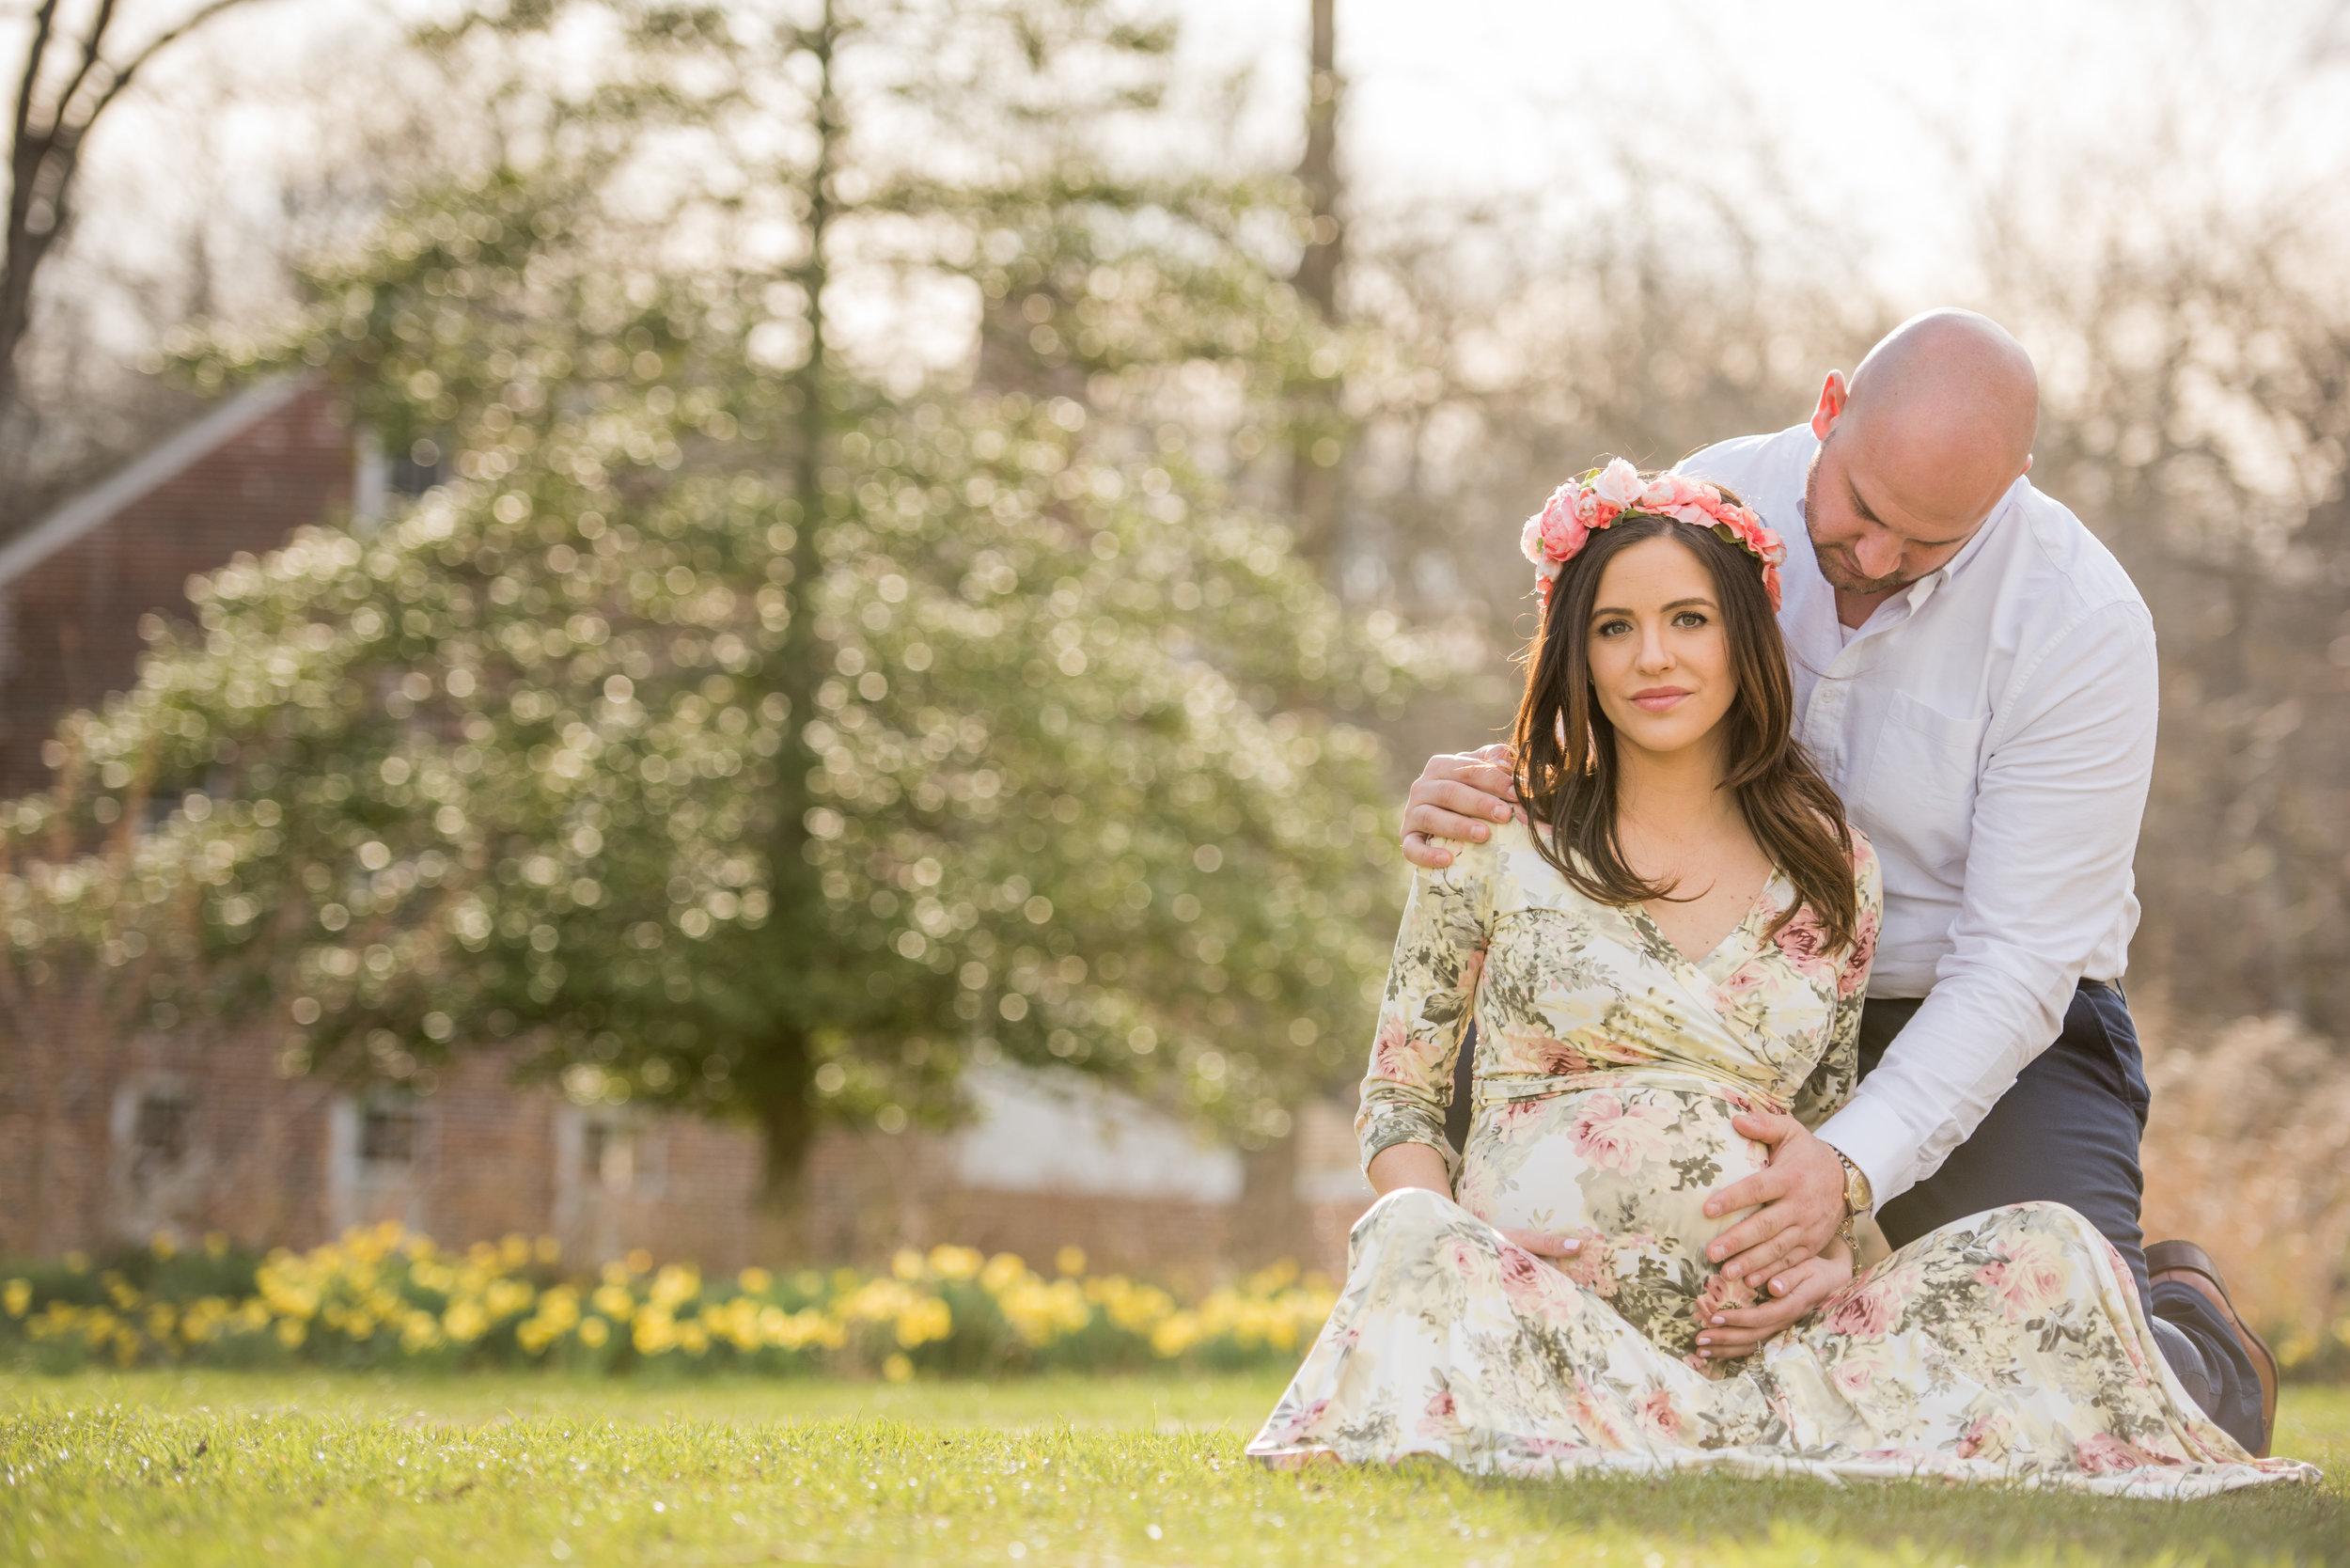 Allaire State Park Maternity Photo, Kristen 17